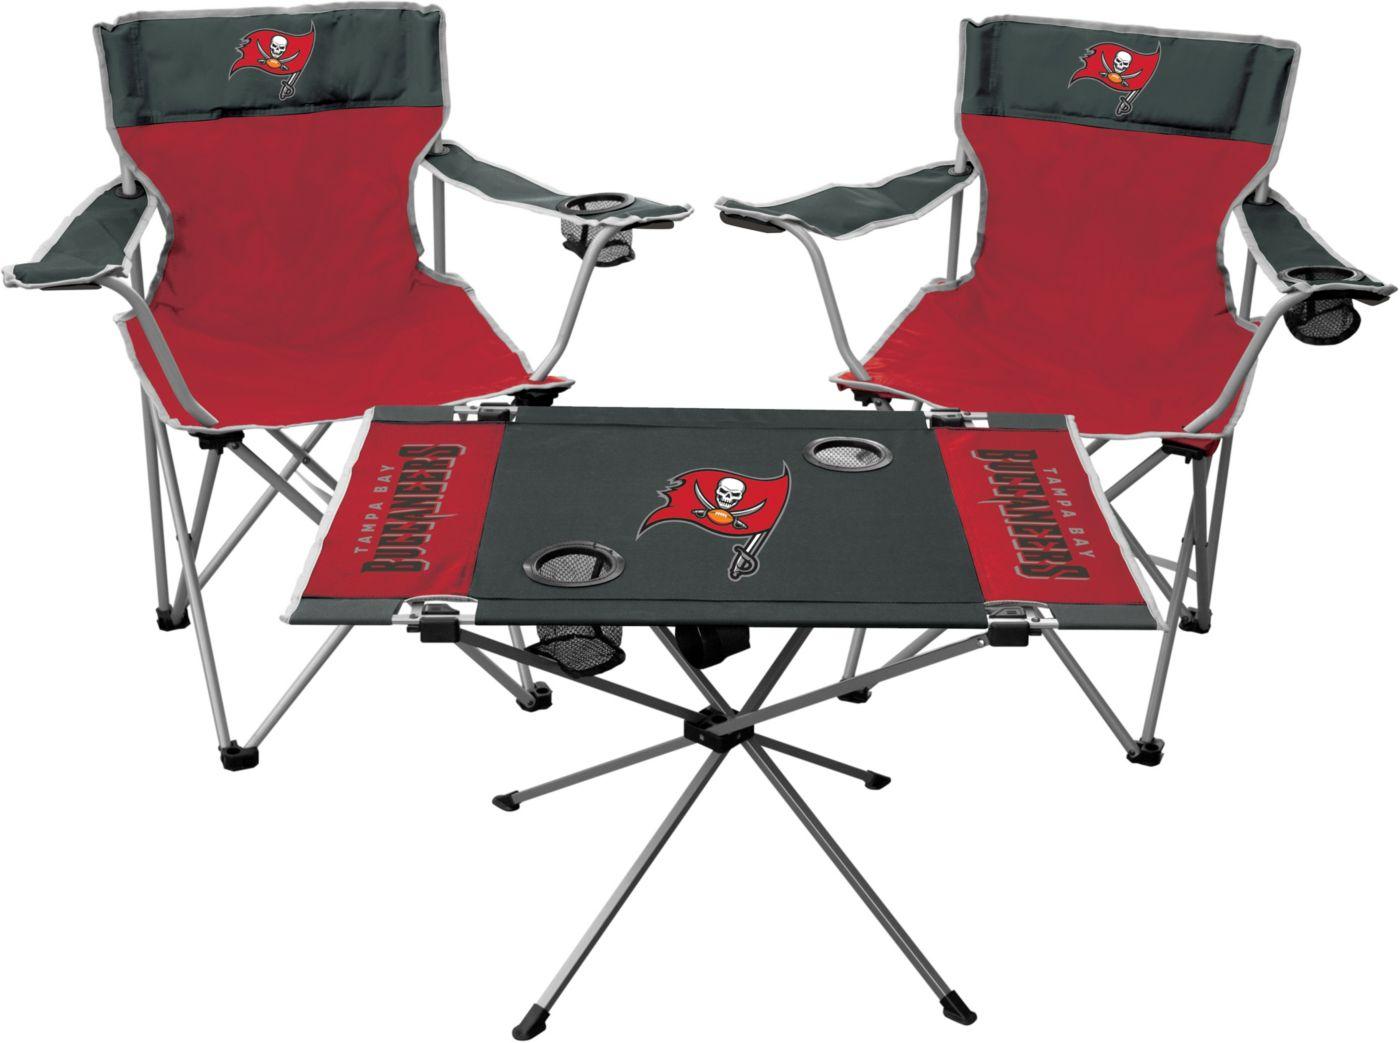 Rawlings Tampa Bay Buccaneers 3-Piece Tailgate Kit